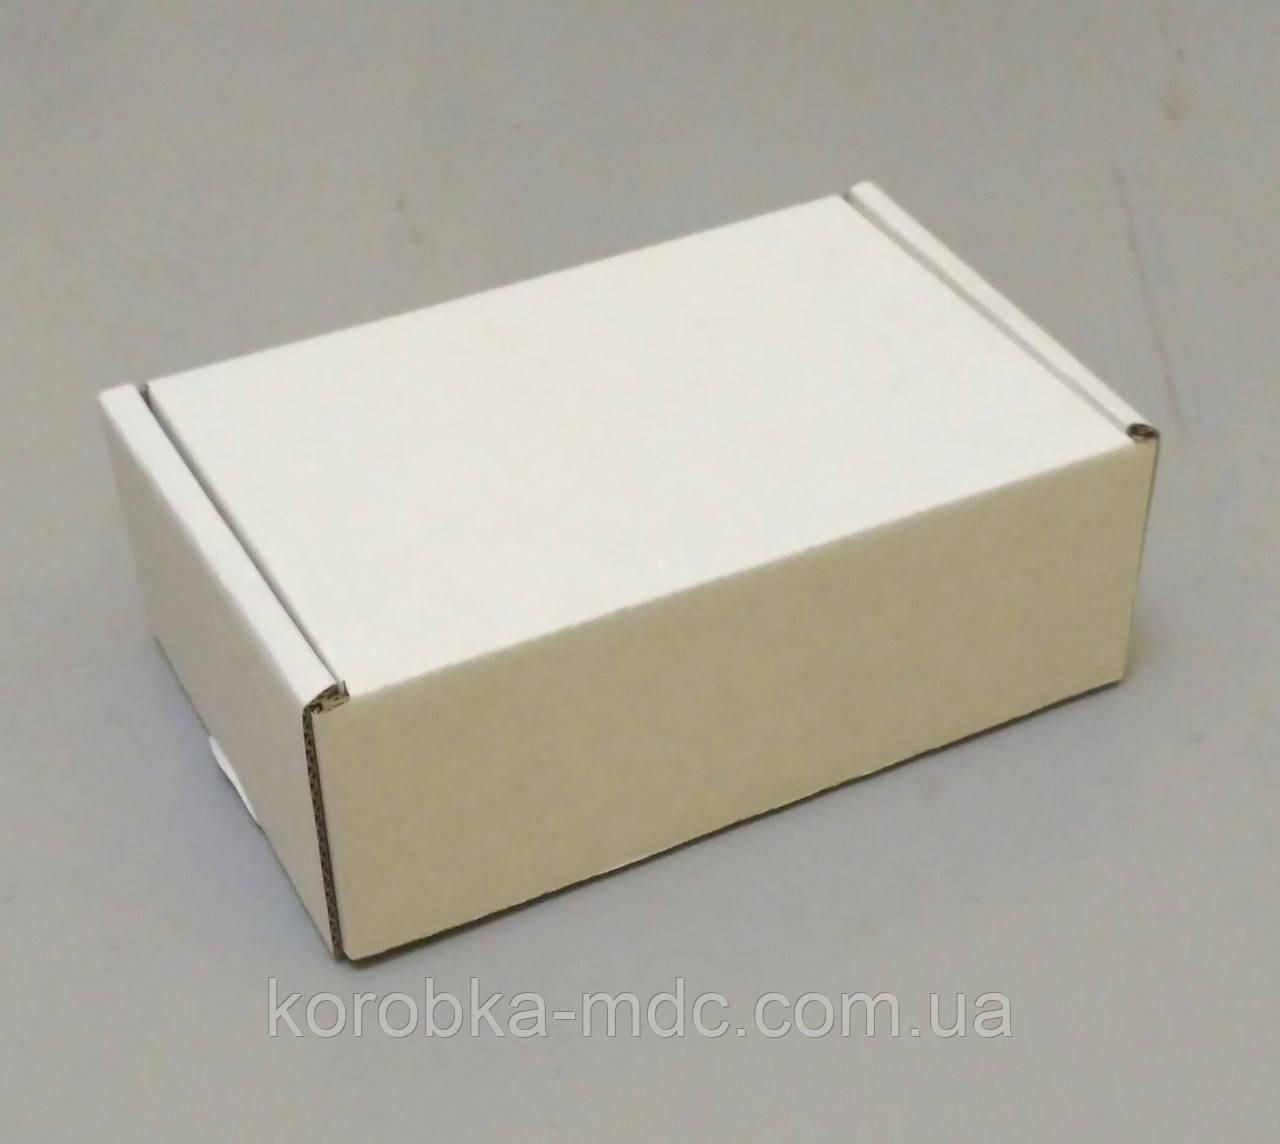 Коробка белая150х100х57 самосборная (шкатулка)